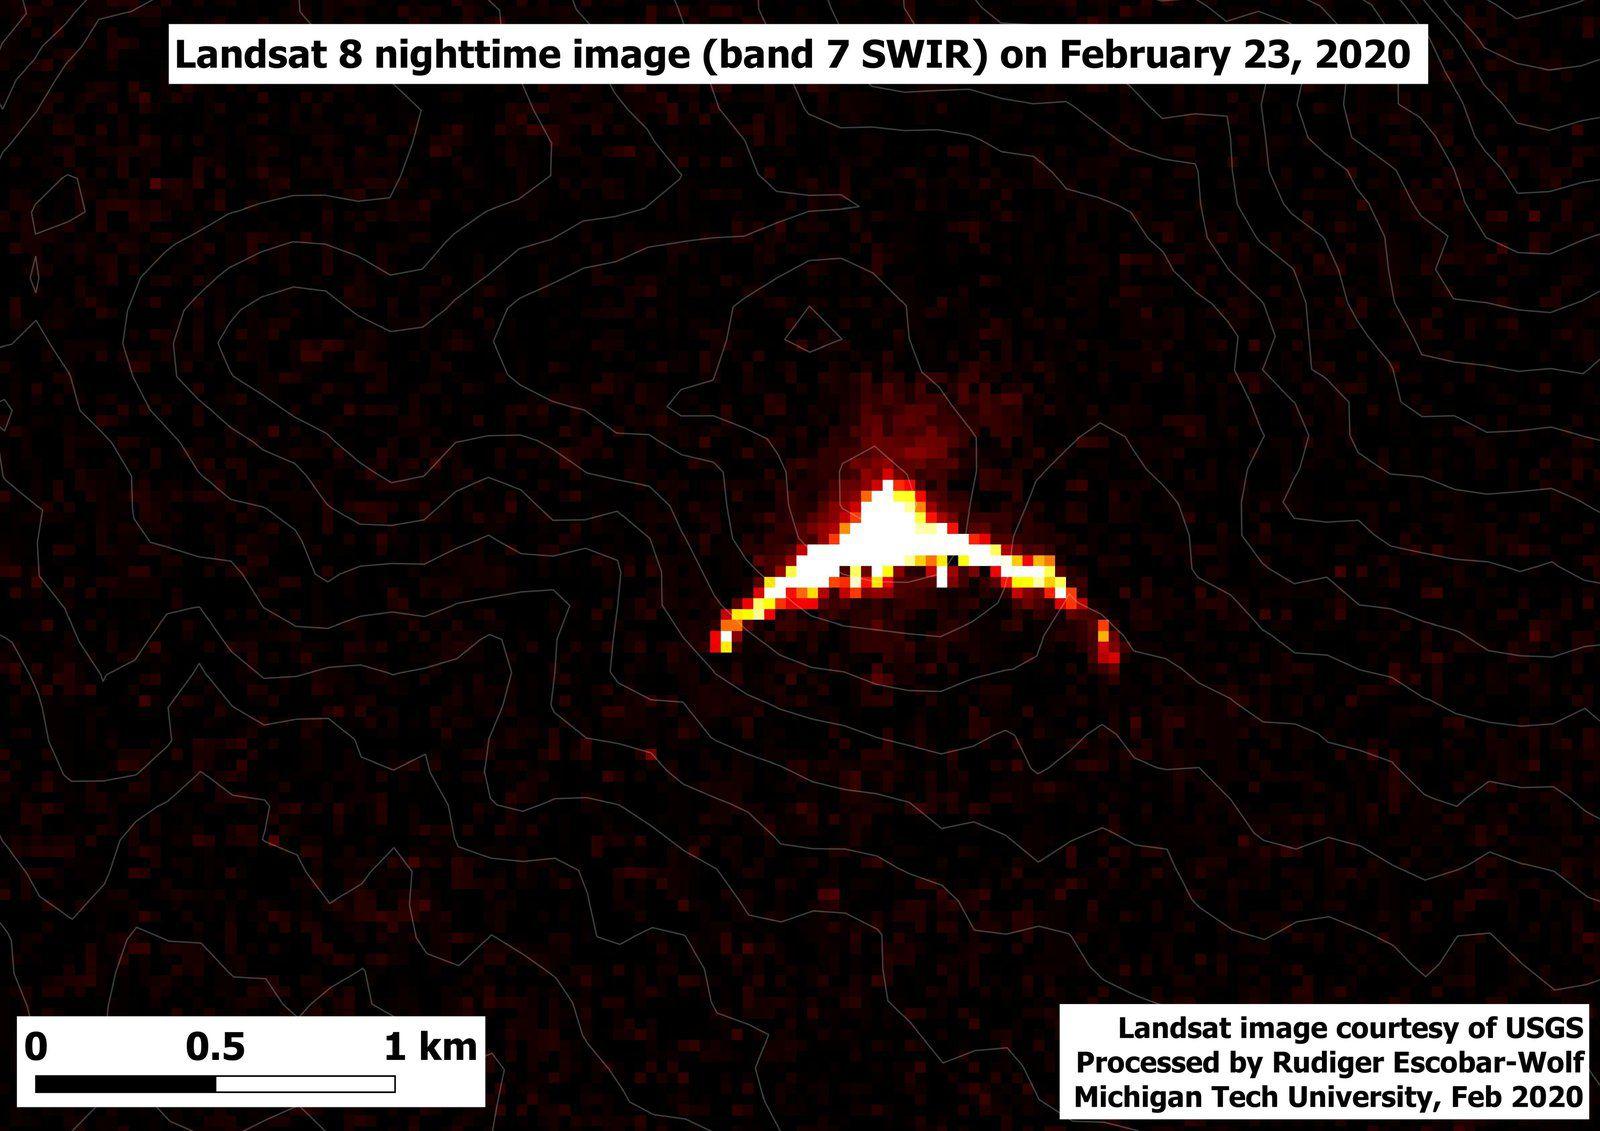 Santiaguito - image Landsat 8 bands 7 SWIR du 23.02.2020 - via R.Escobar-Wolf / MTU